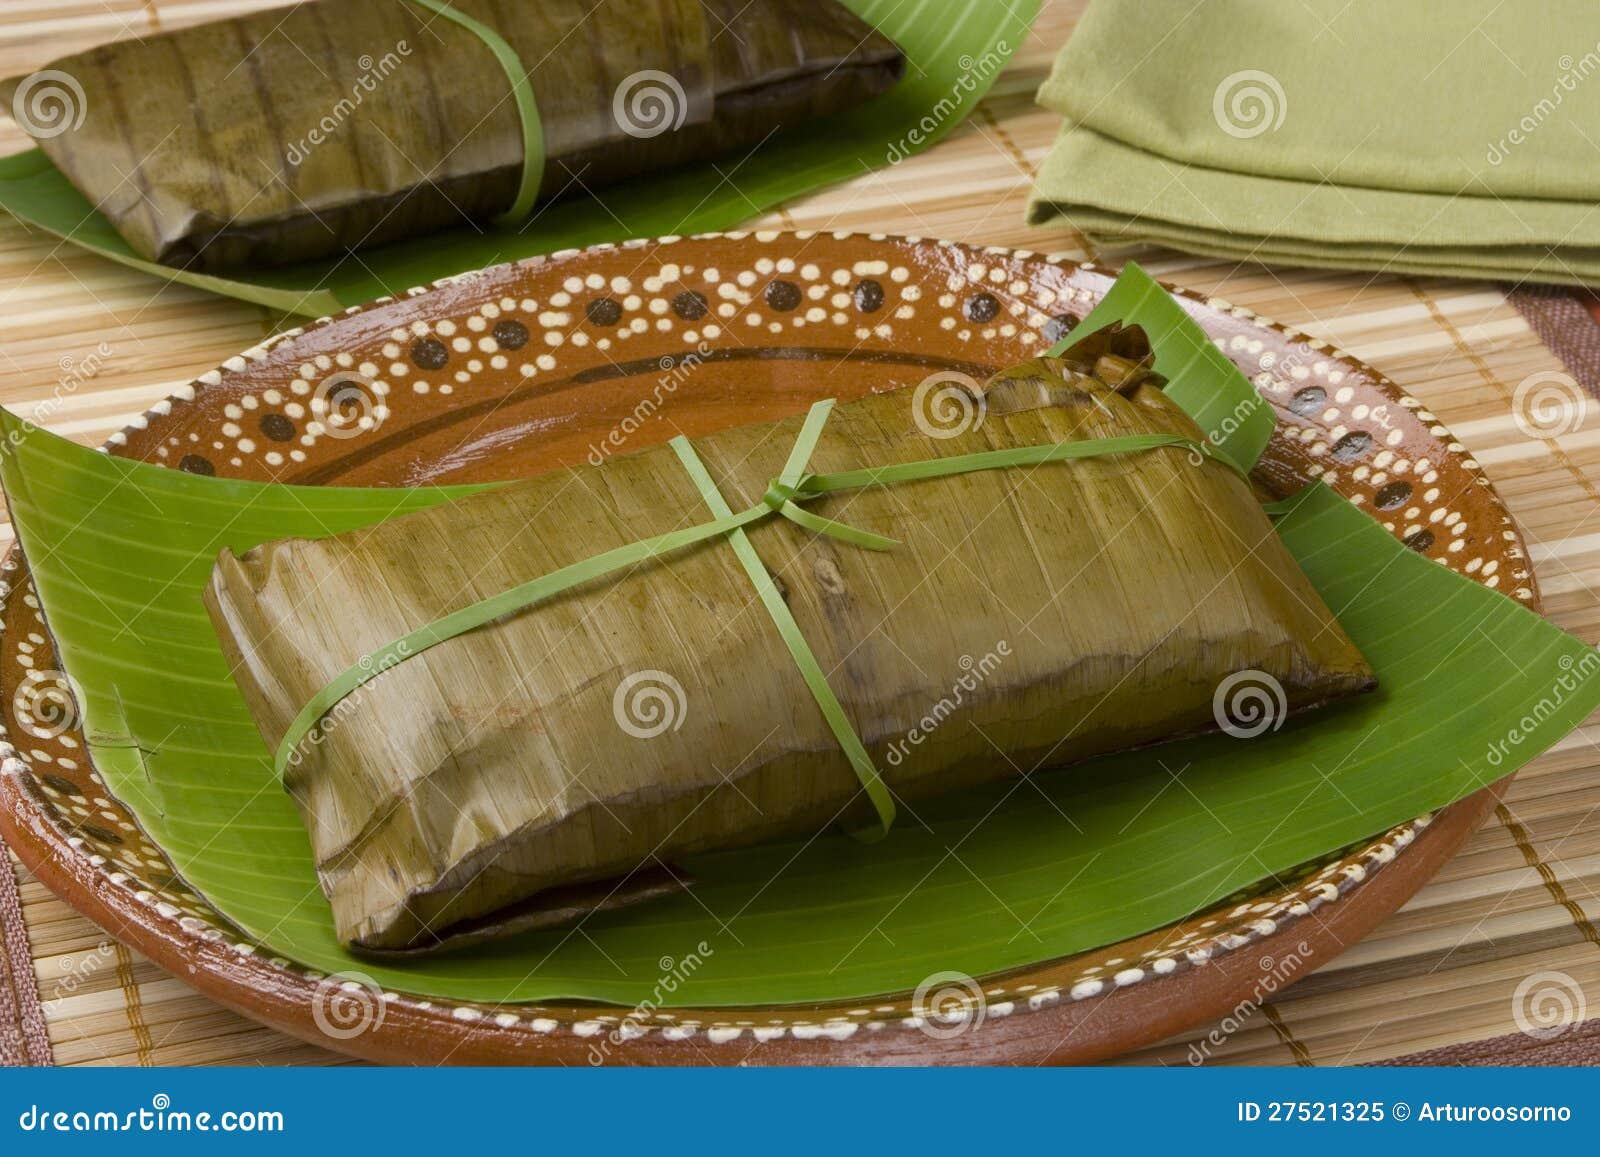 tamales oaxaca 27521325